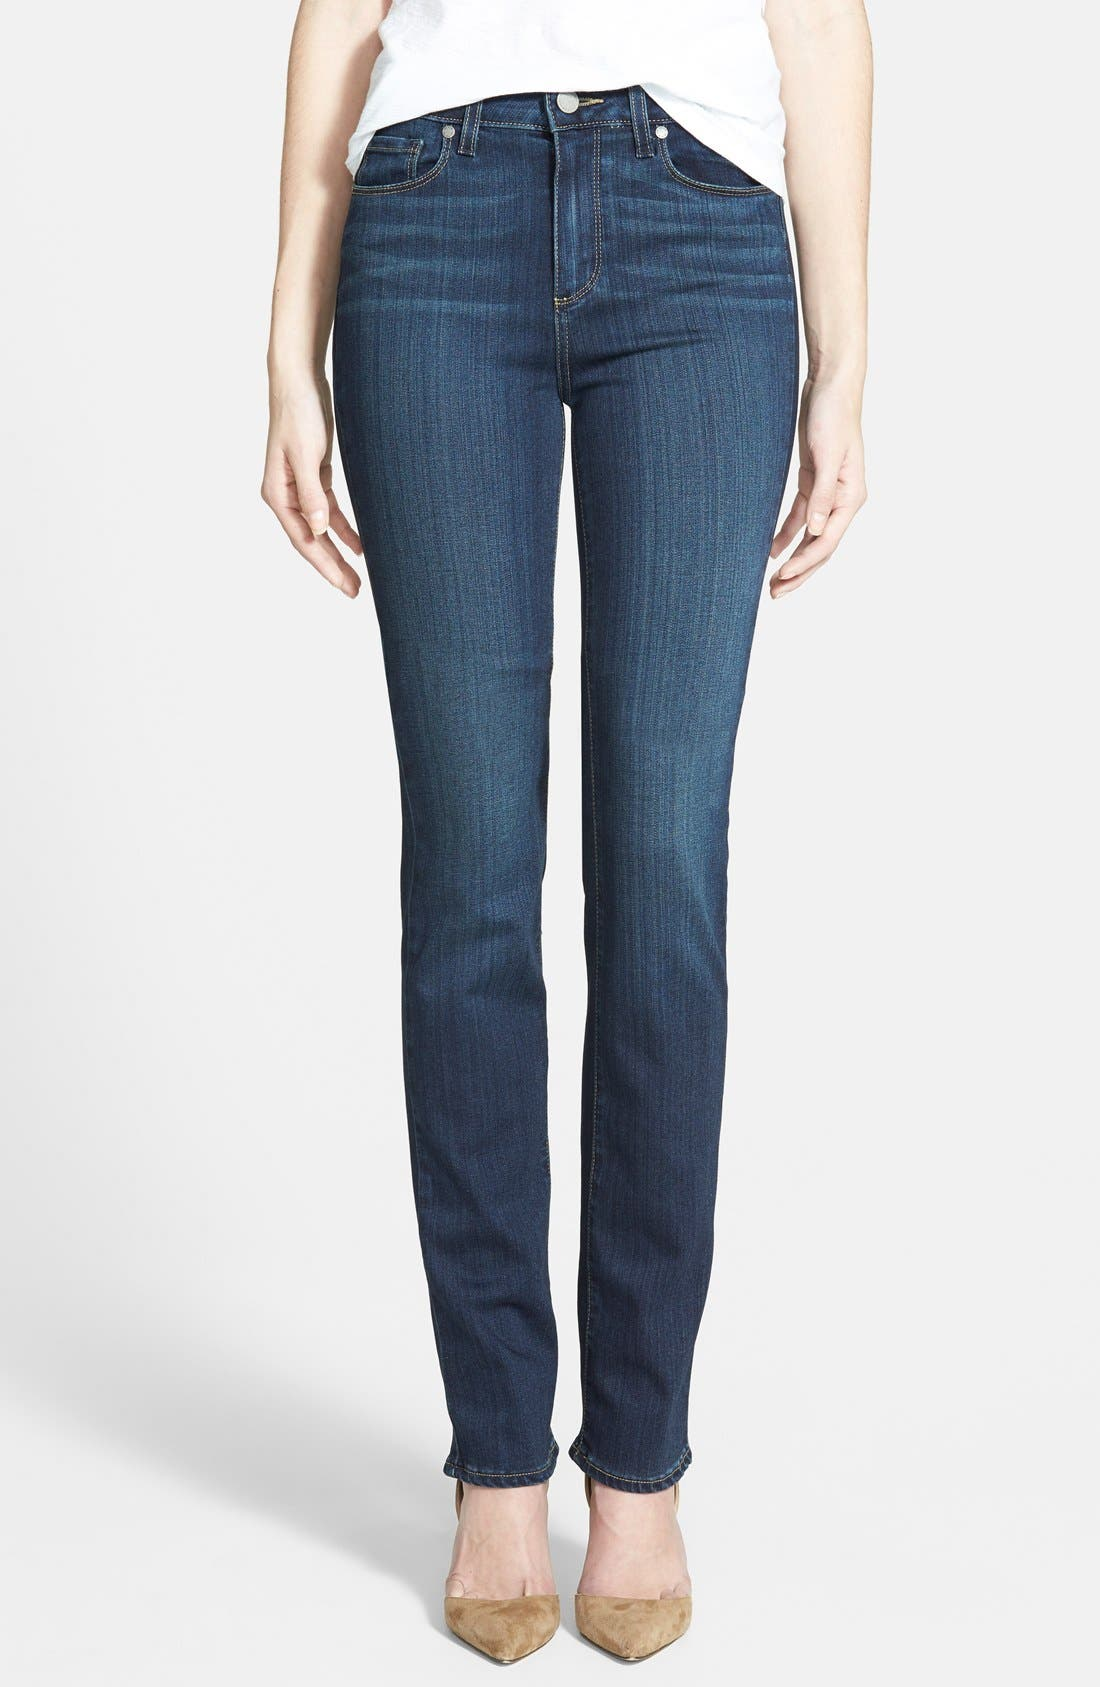 'Transcend - Hoxton' High Rise Straight Leg Jeans,                         Main,                         color, Nottingham Blue